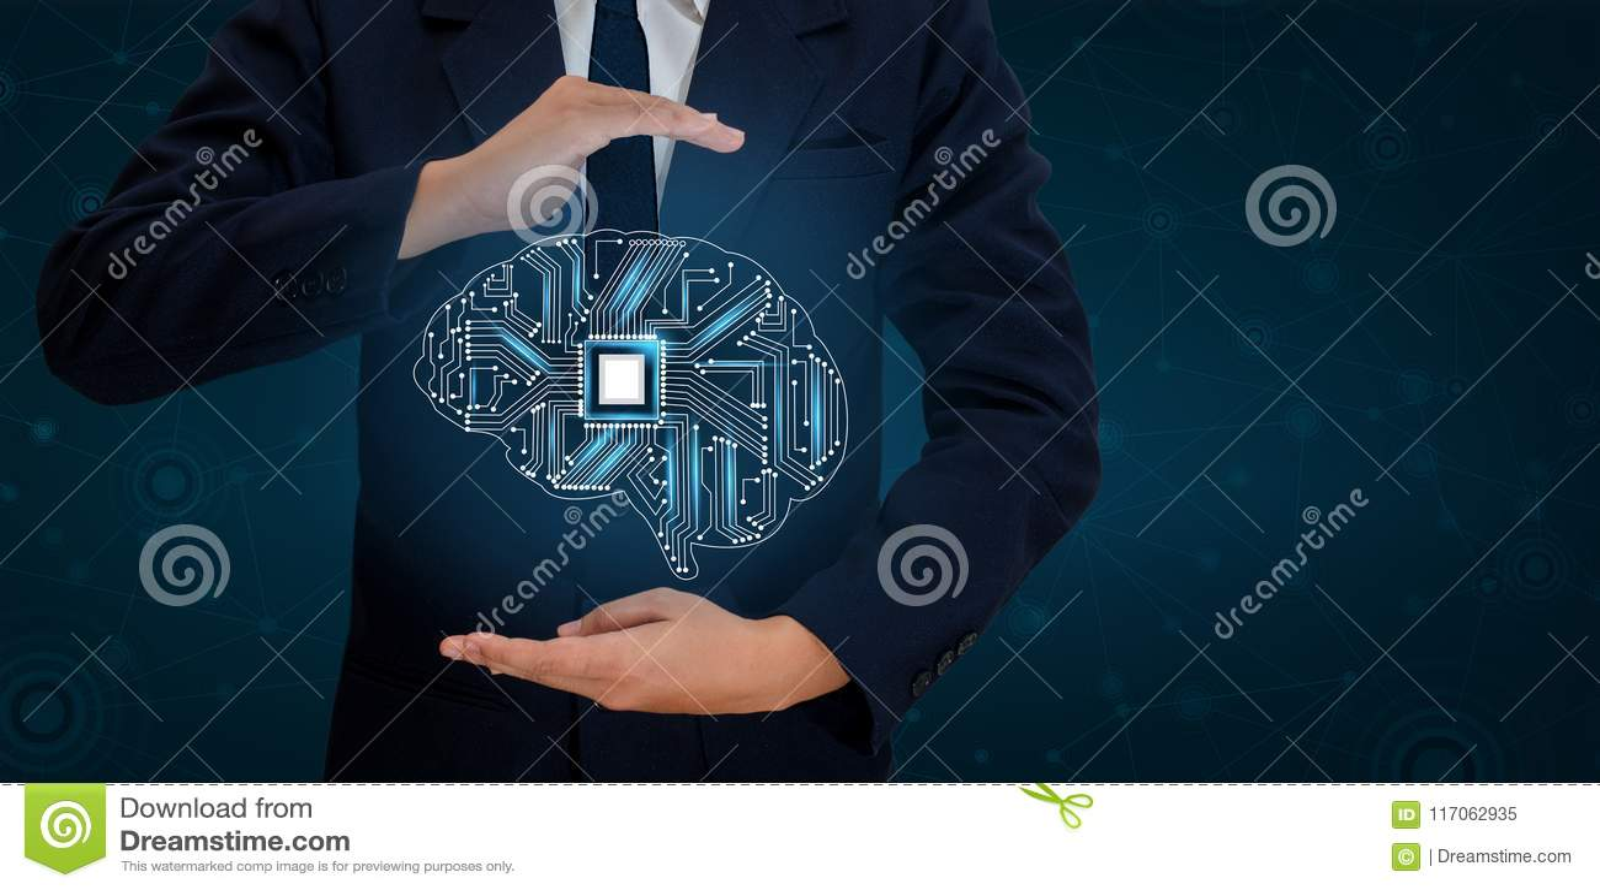 AI Hand de Bedrijfsmensen drukken de telefoon Brain Graphic Binary Blue Technology